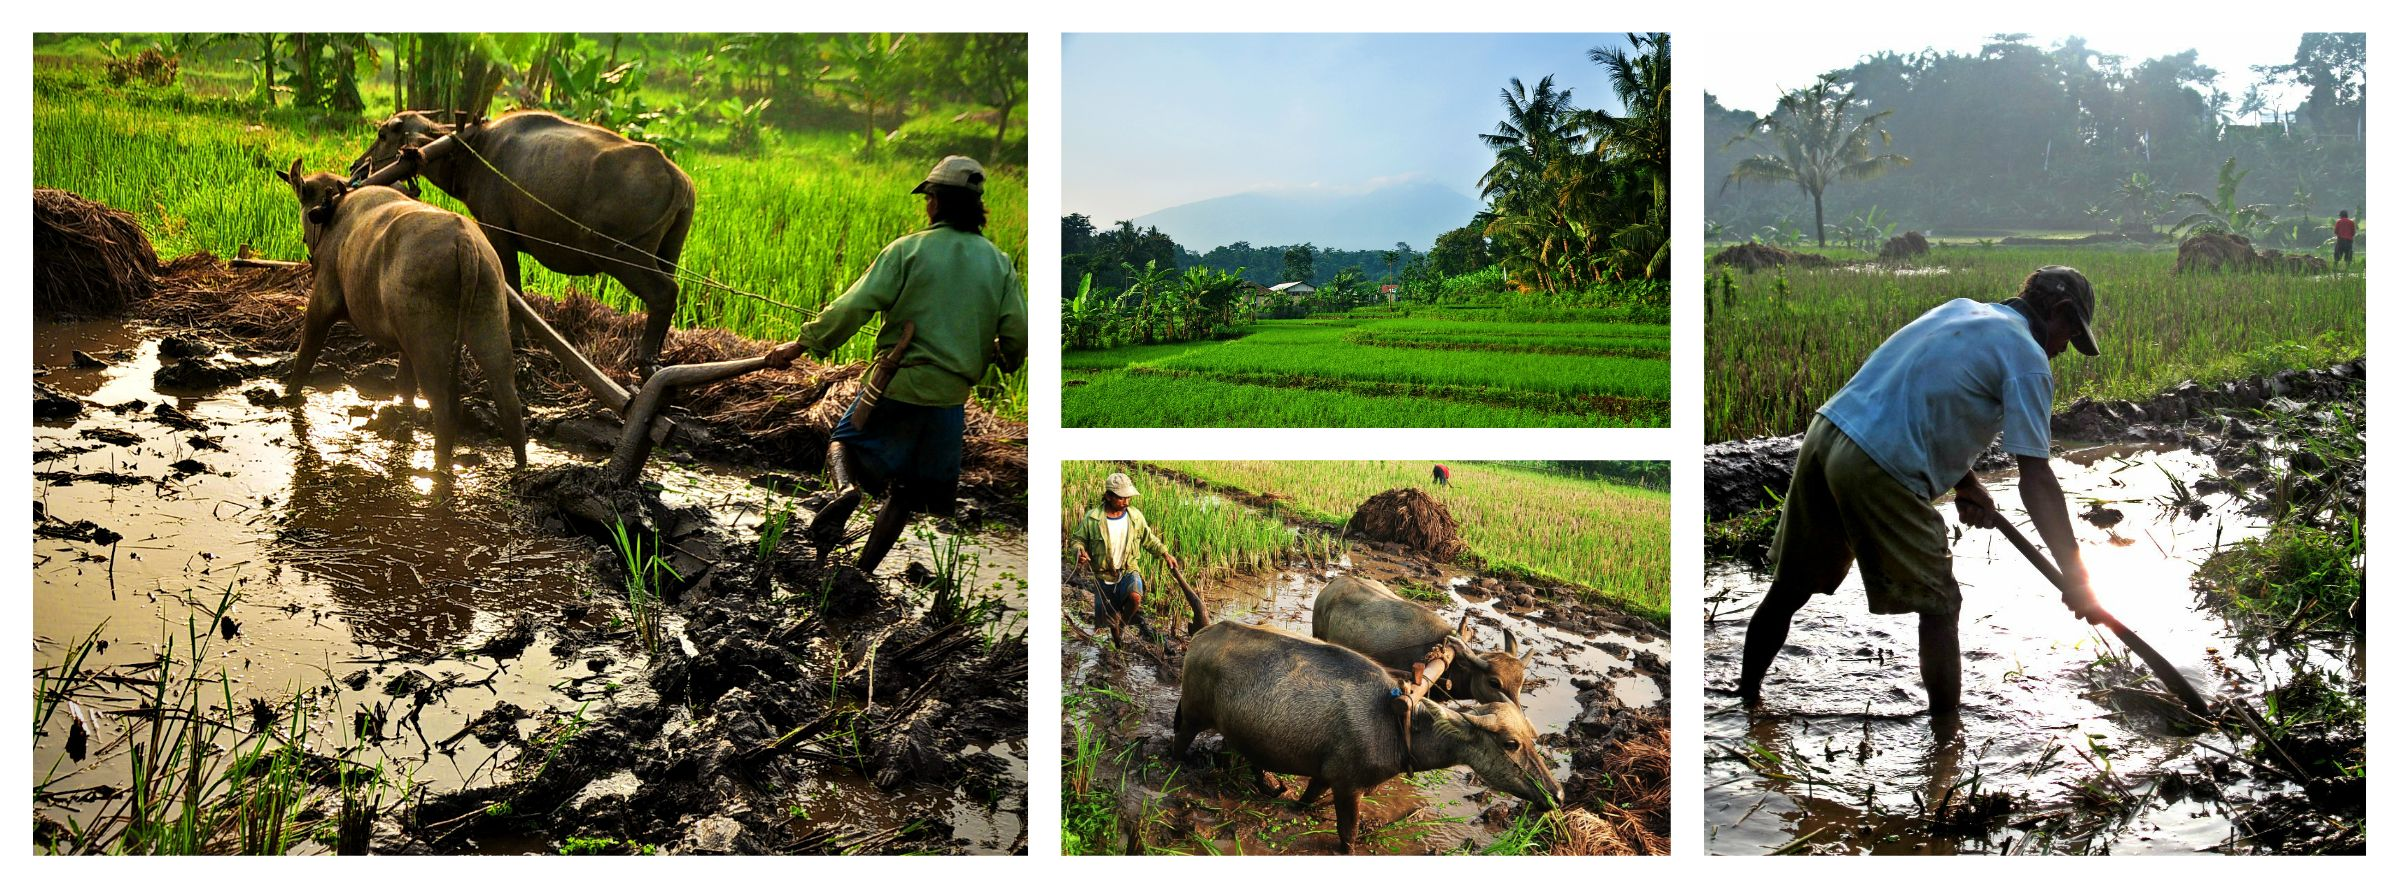 Kampung Budaya Sindang Barang Love Nature Culture Aktivitas Pagi Sindangbarang